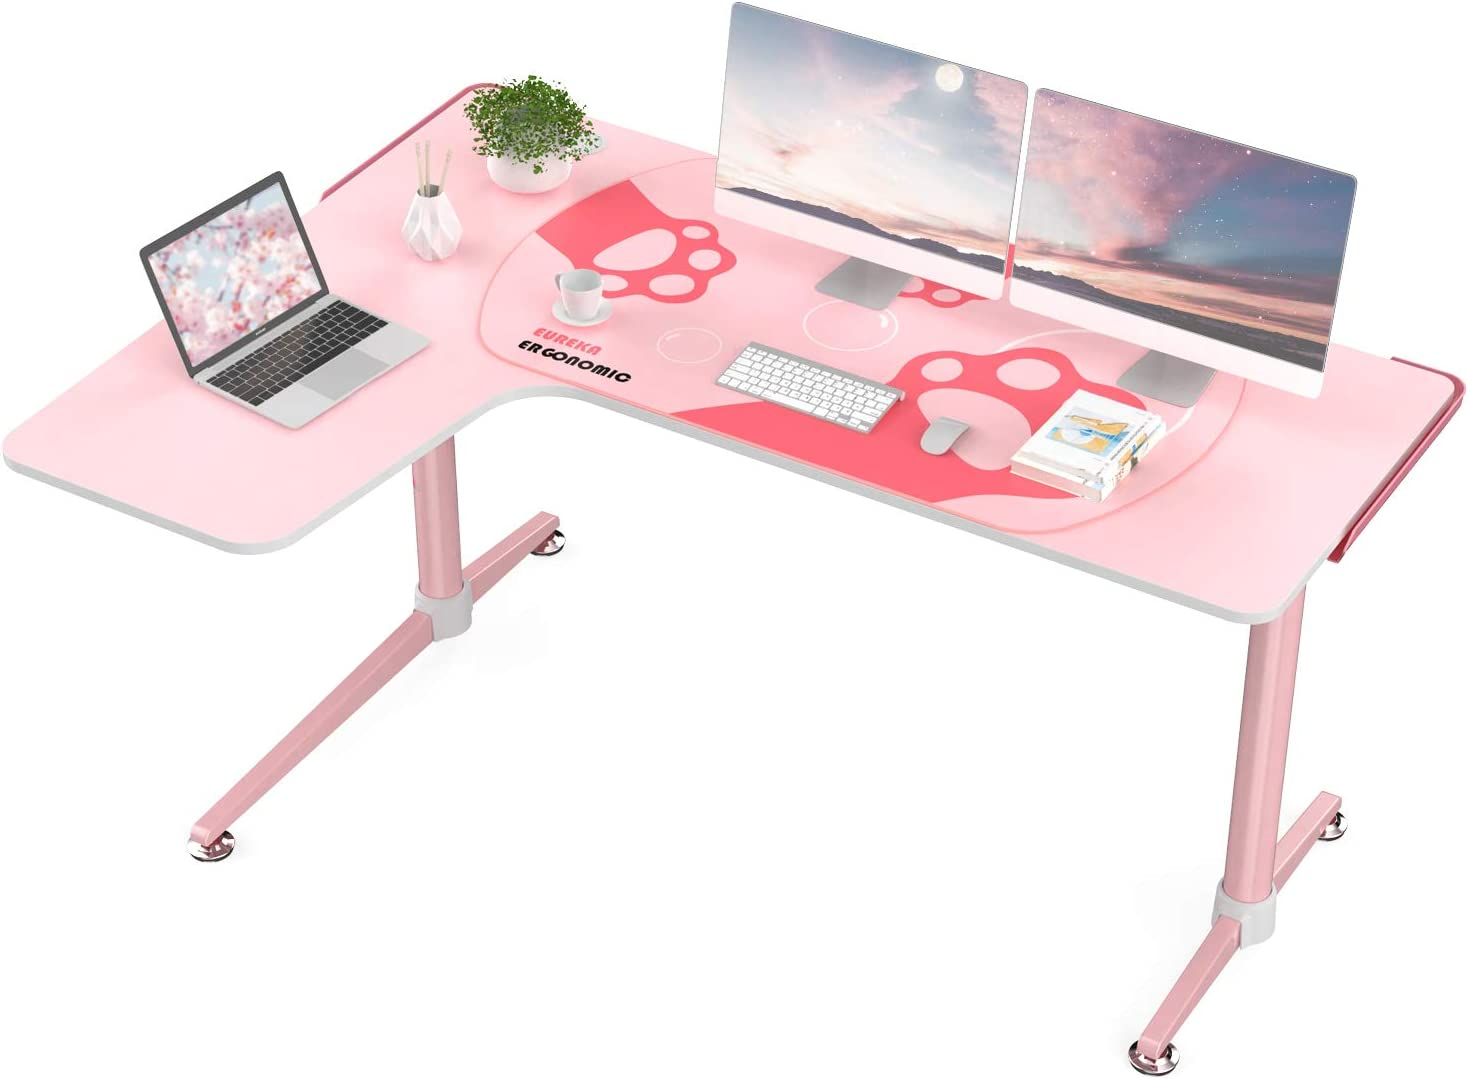 EUREKA ERGONOMIC L60 Corner Gaming Desk, L-Shape Pink Gaming Computer Desk Home Office Writing Table 60 X 43in W Mousepad Popular Gift for Girl/Female/E-Sports Lover Left Side